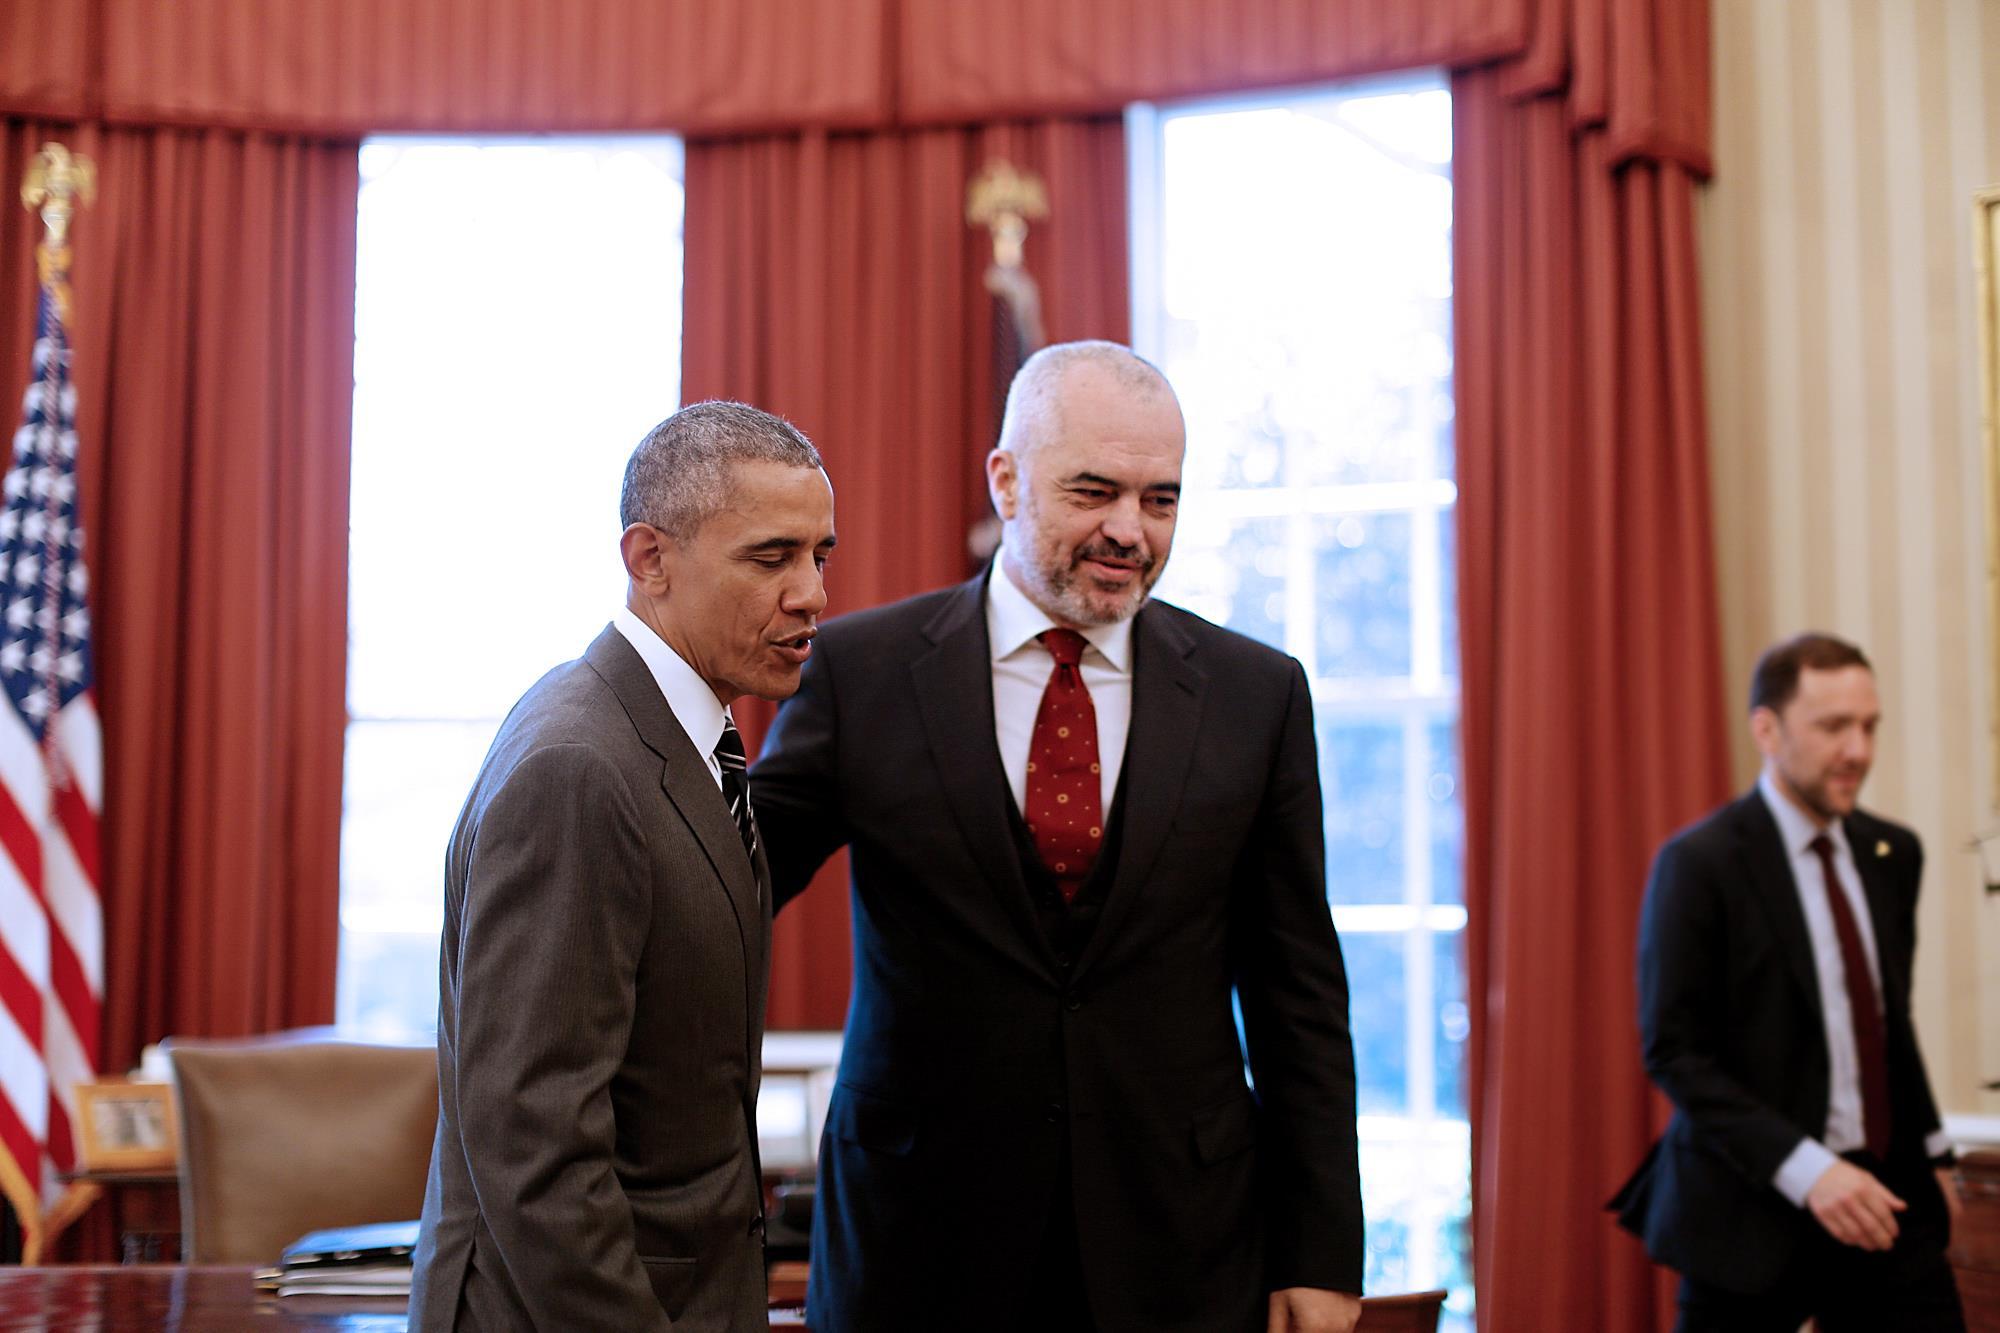 Albania's pro-European, pro-reform prime minister Edi Rama met with US president Barack Obama last week. (Facebook)